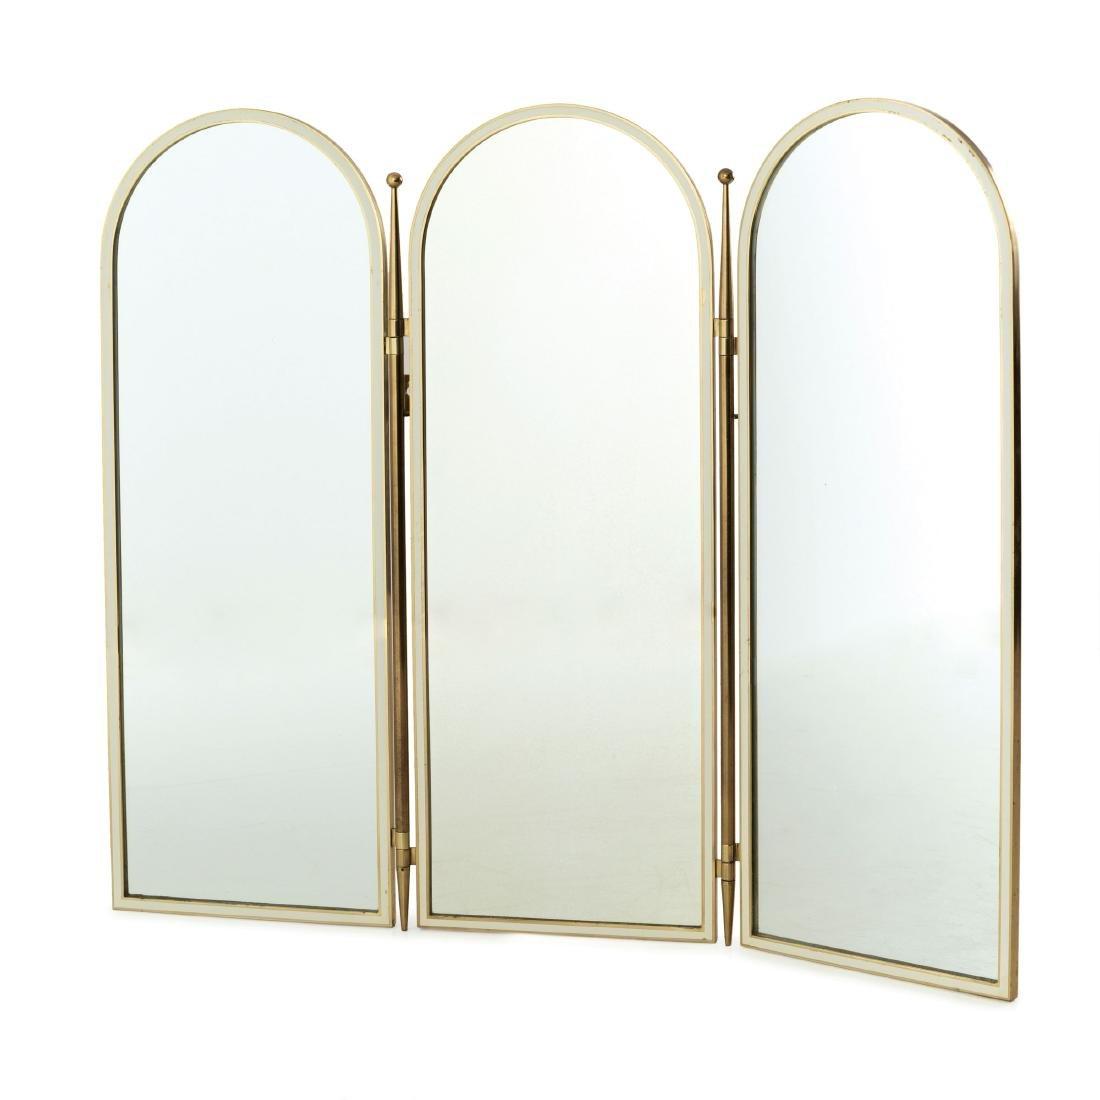 Three-piece mirror, c. 1953